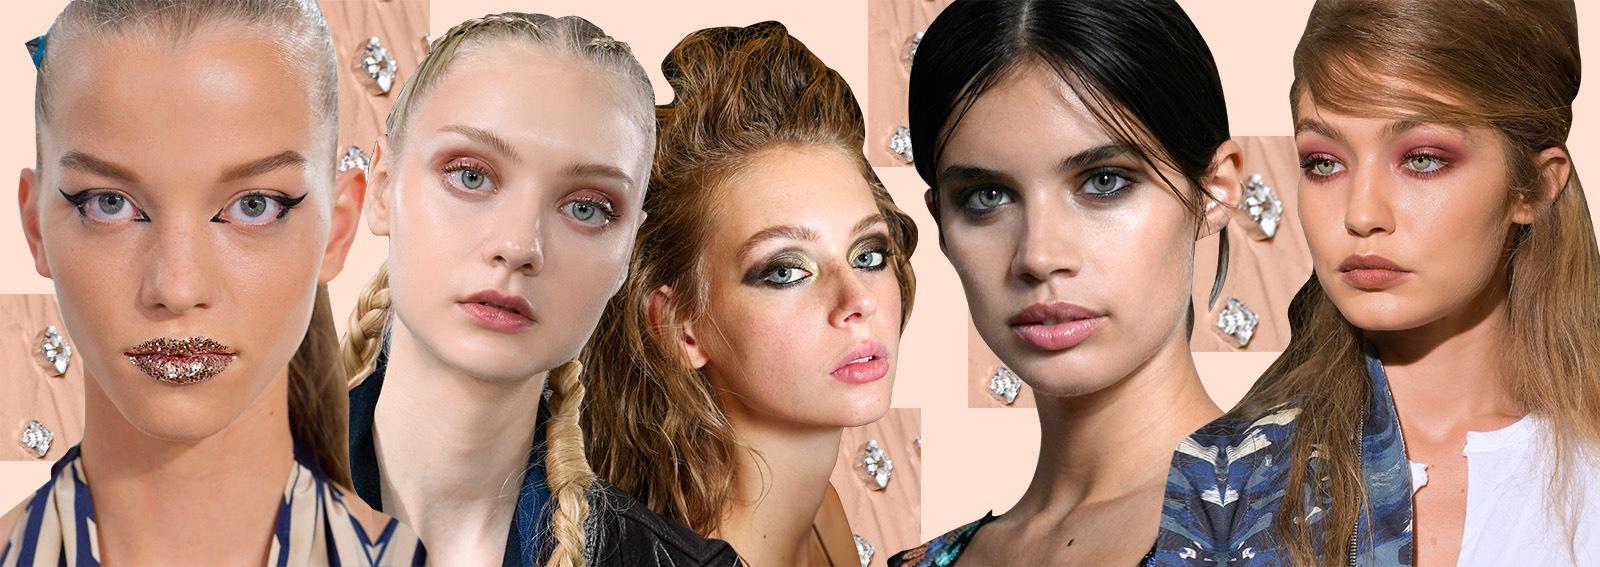 tendenze trucco primavera estate 2017 make up collage_desktop